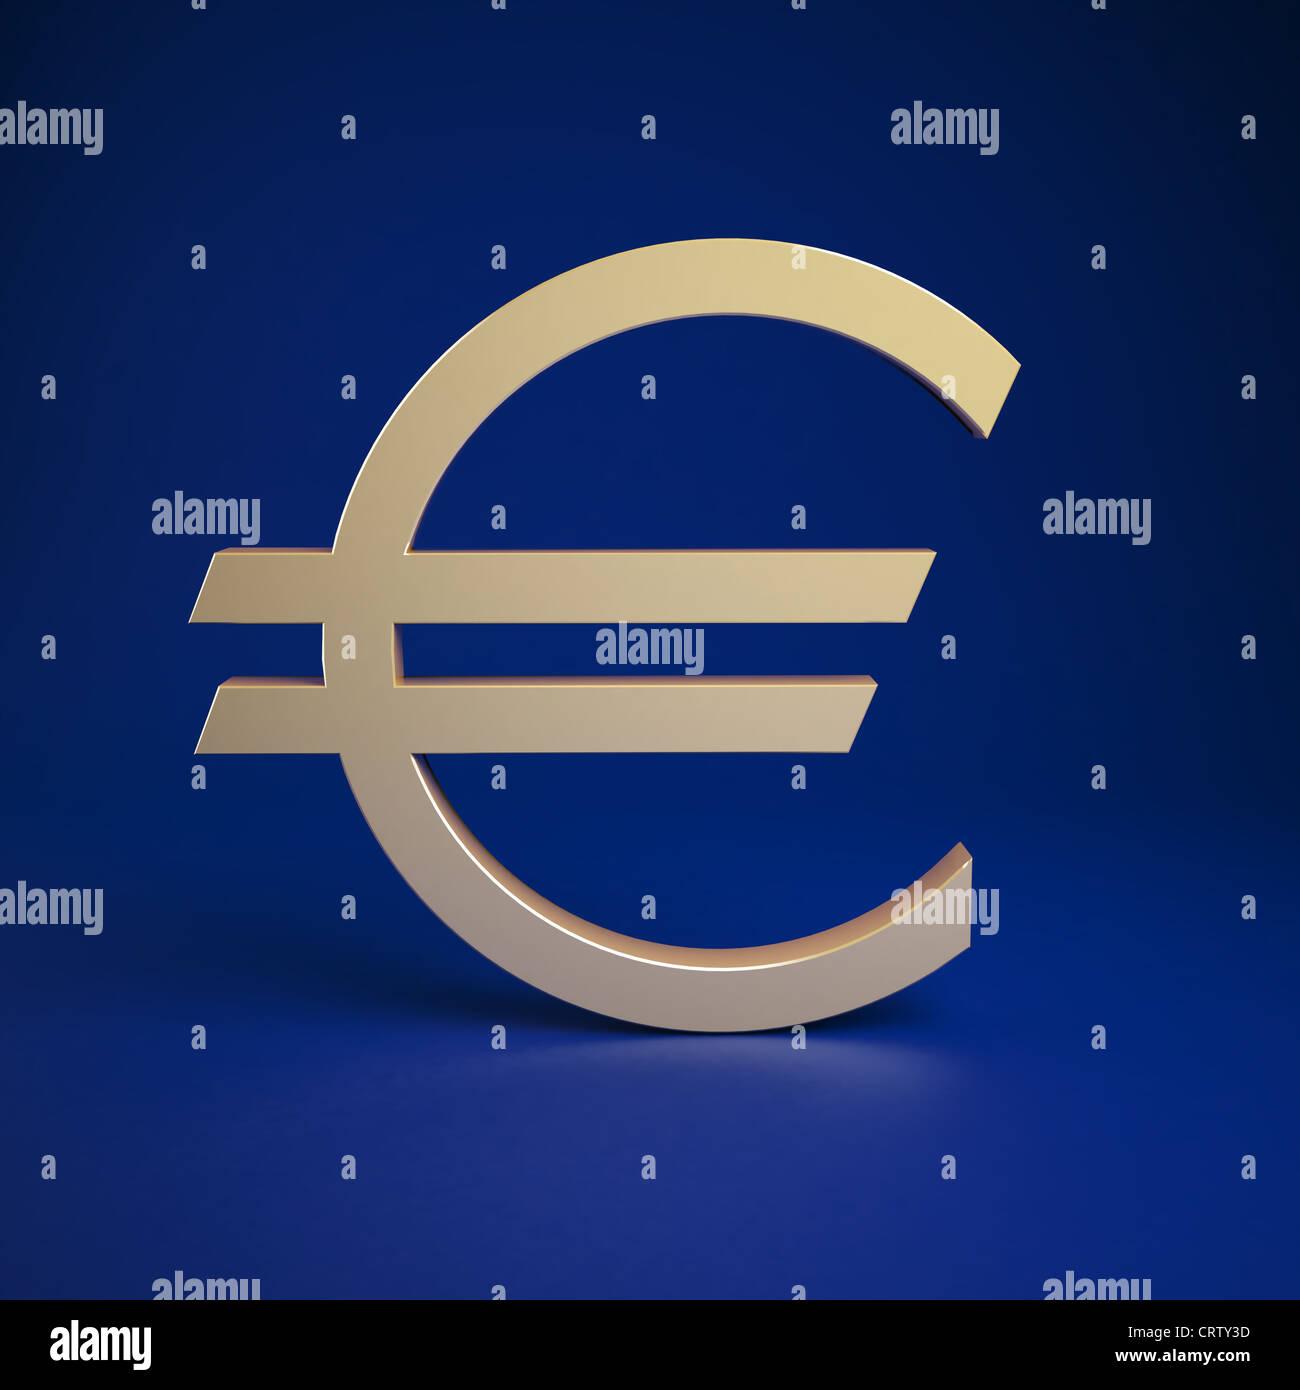 Set Us Uk Currency Symbols Dwc Water Softener Diagram